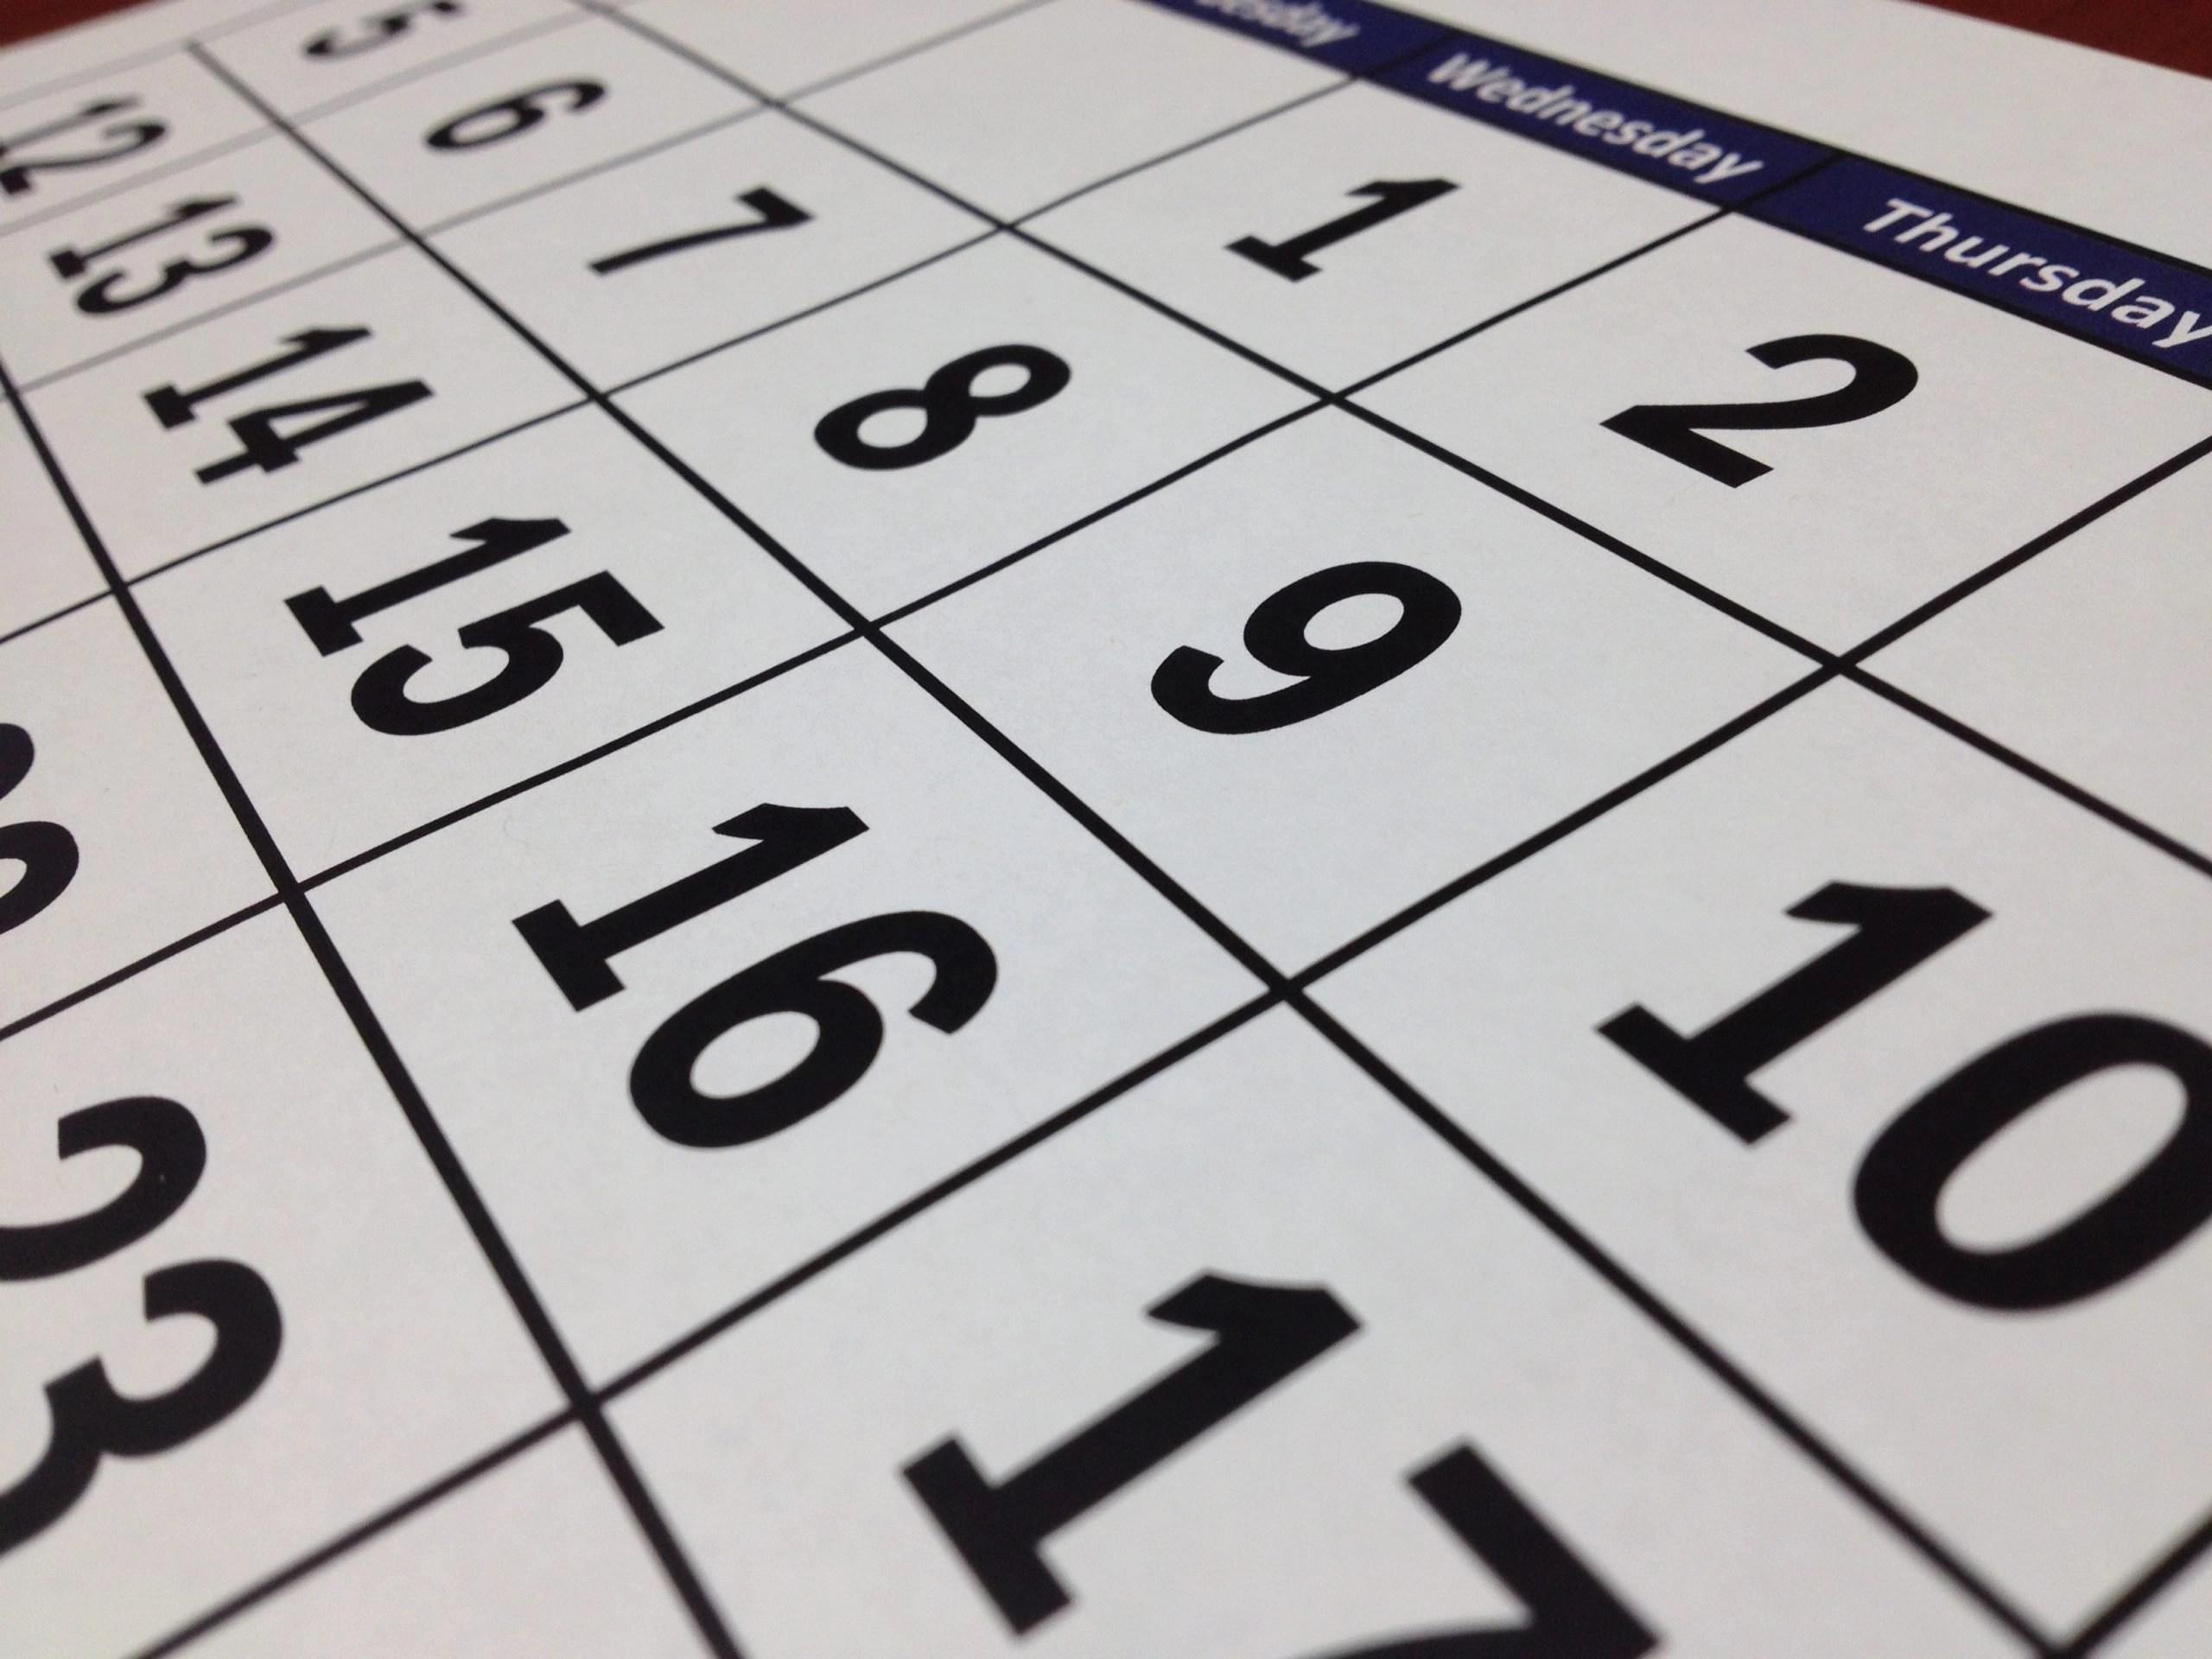 Calendar close-up symbolizing planning